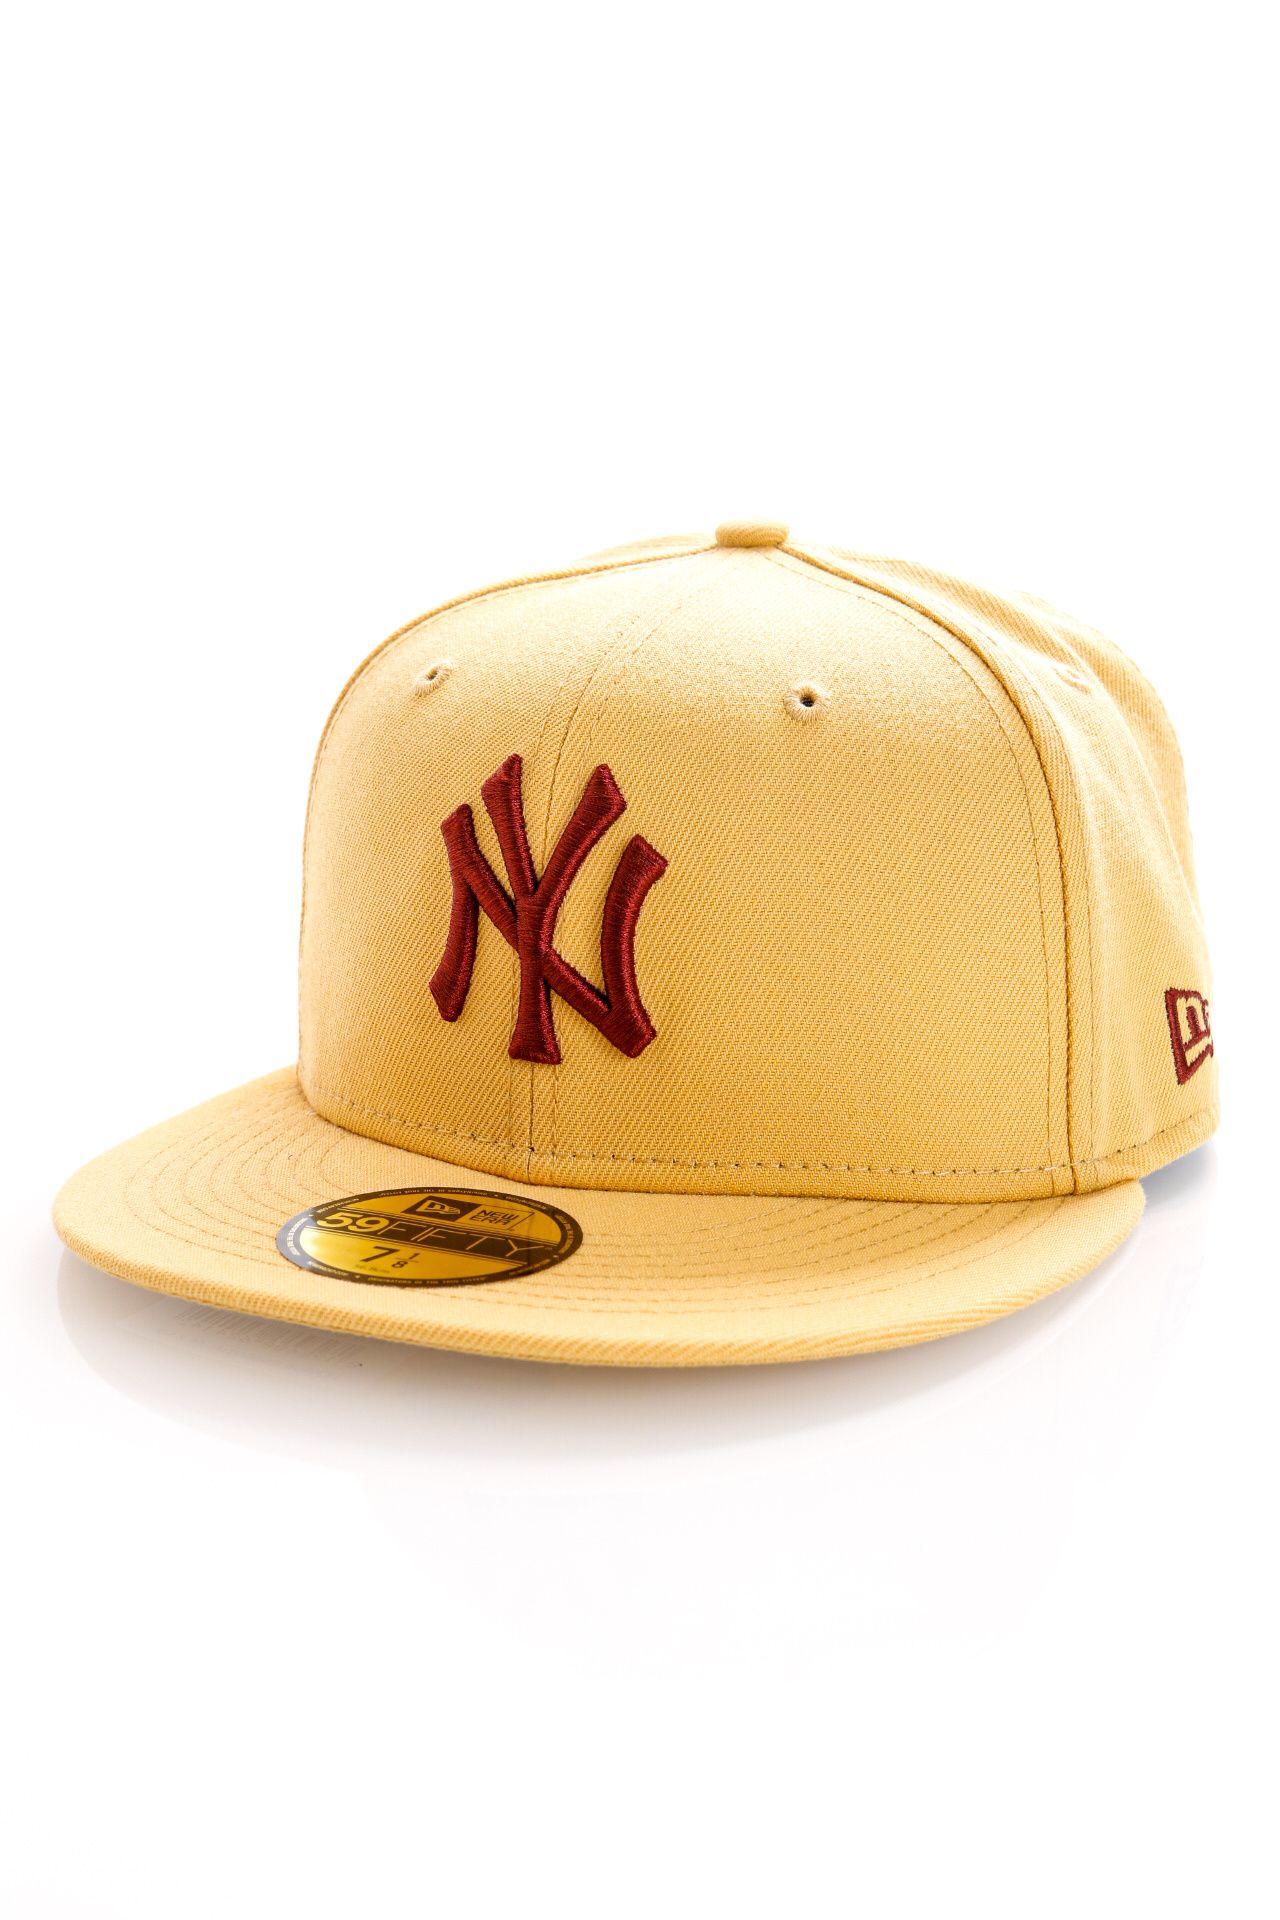 Afbeelding van New Era New York Yankees Fitted Cap LEAGUE ESSENTIAL 59FIFTY NEYYAN Cream/Red NE60141438